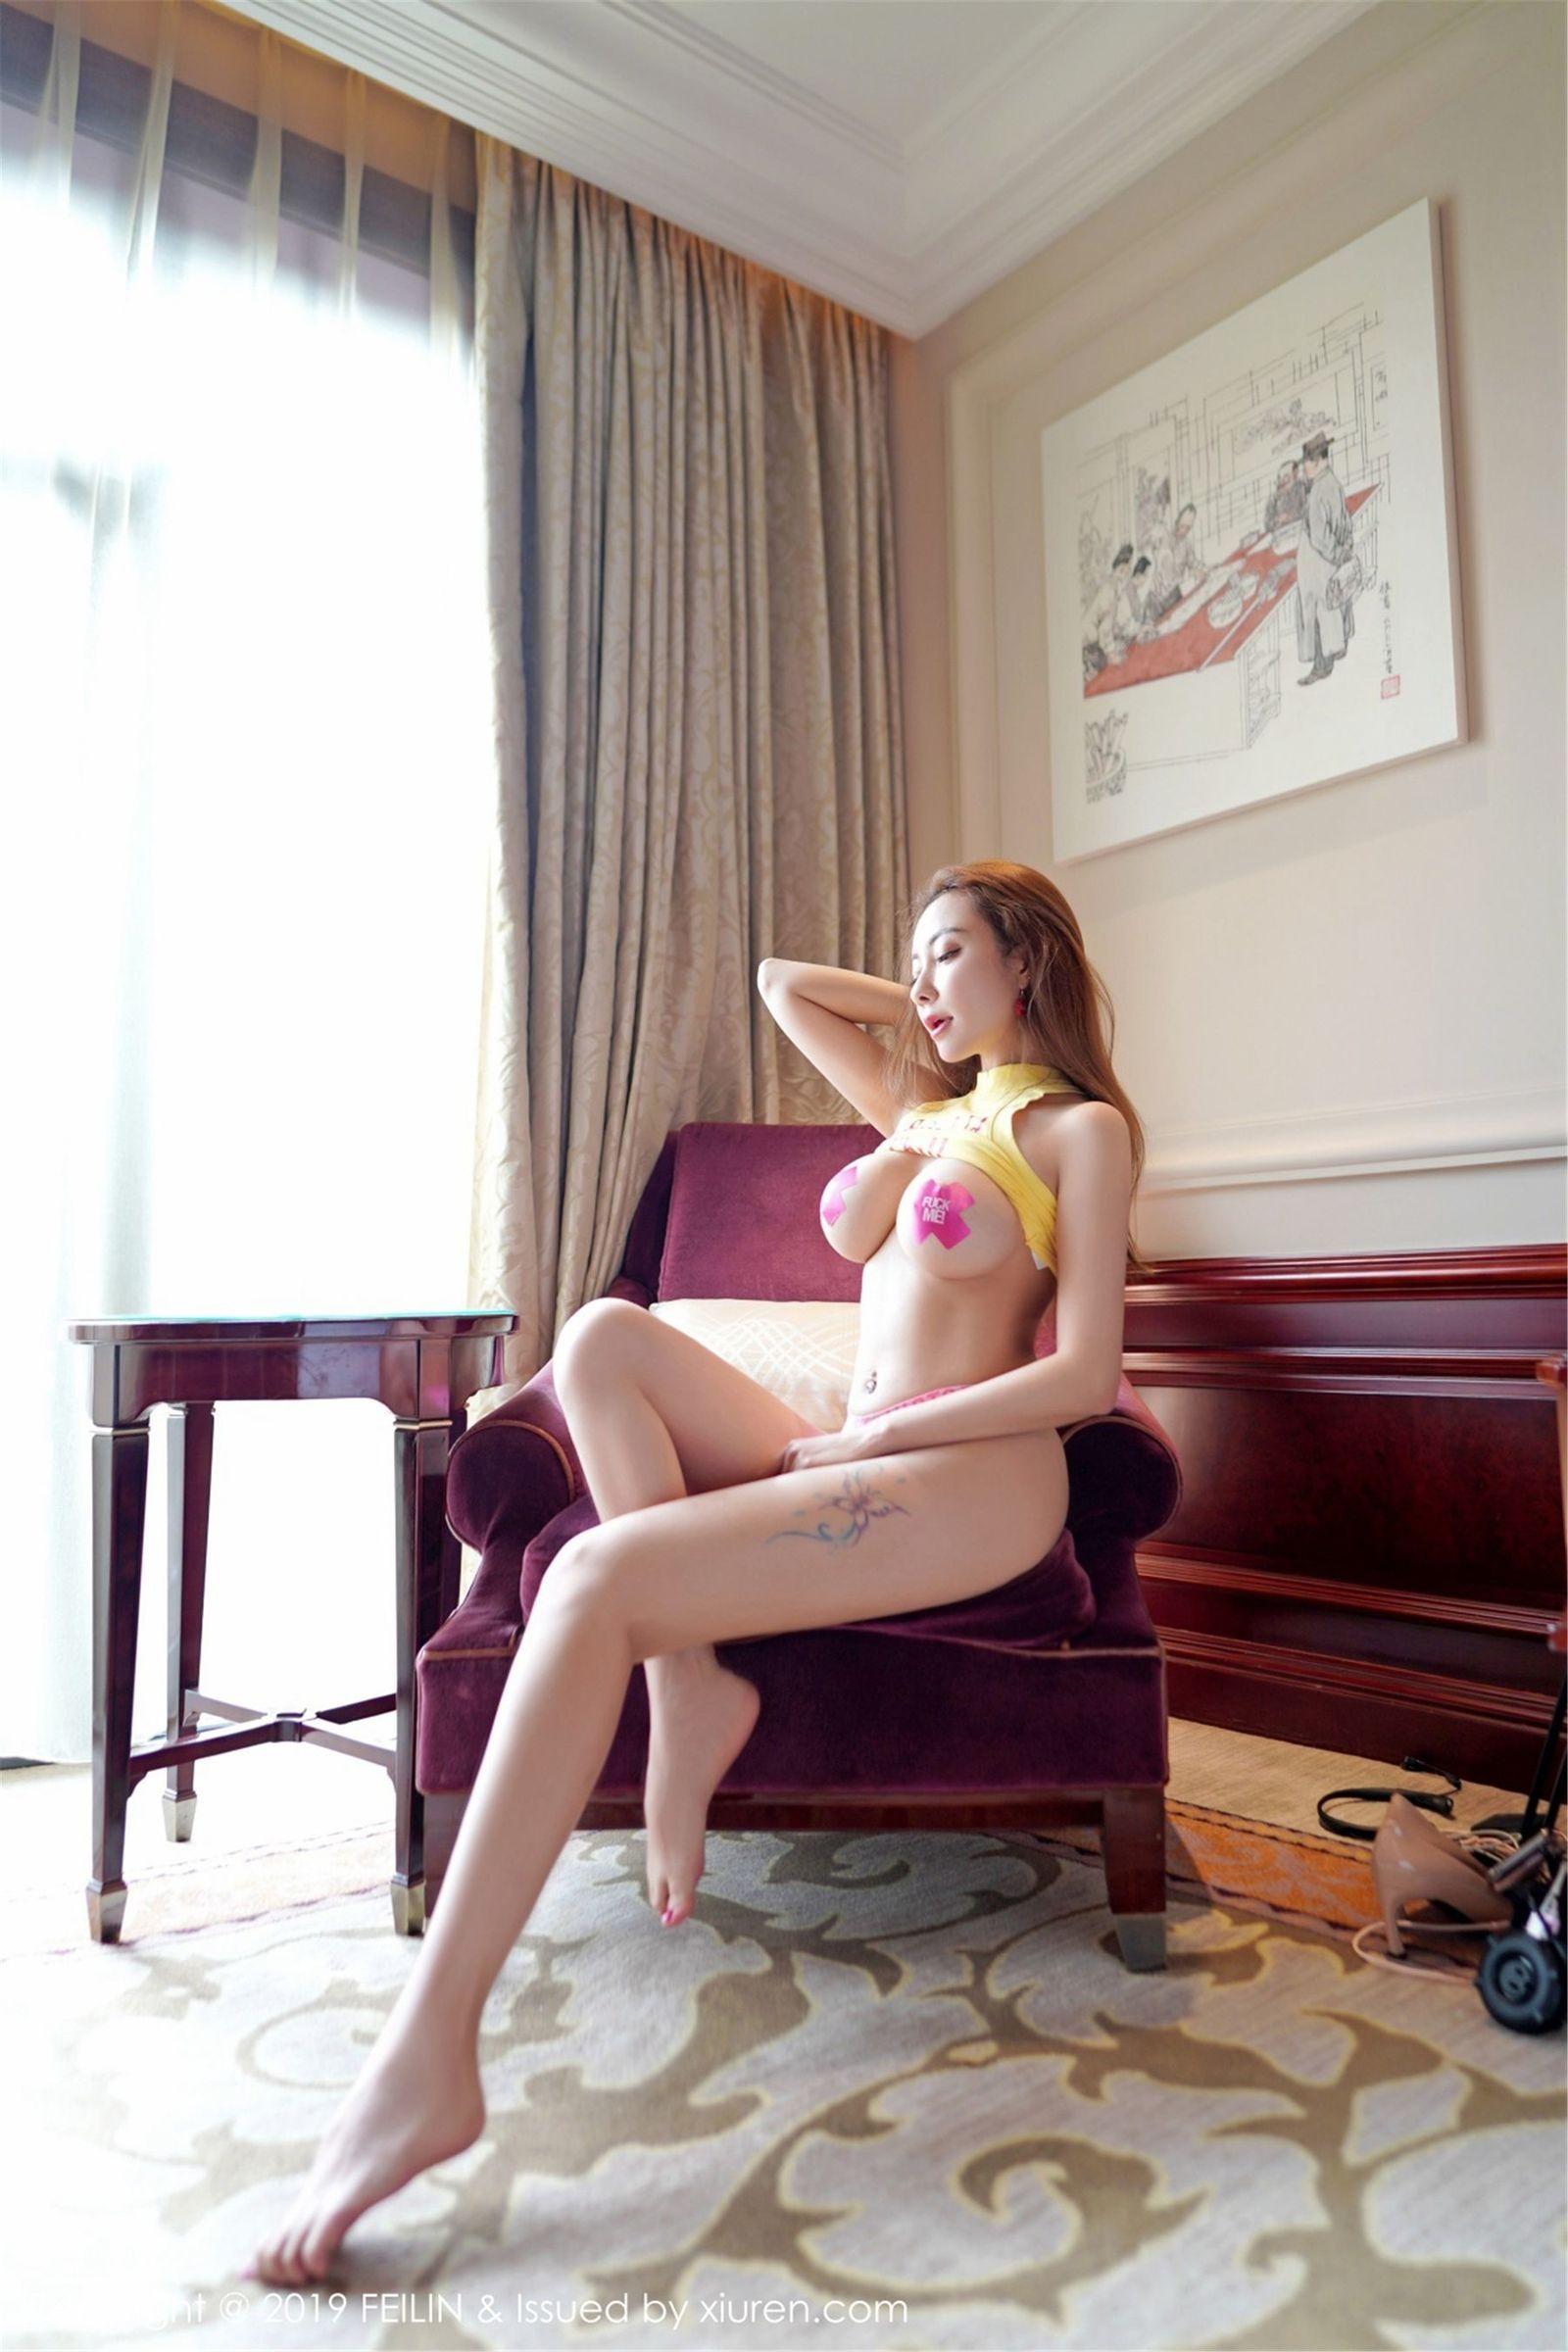 [FEILIN嗲囡囡] Vol.191 御姐@果儿Victoria性感私房魅惑丝袜美图[49P]